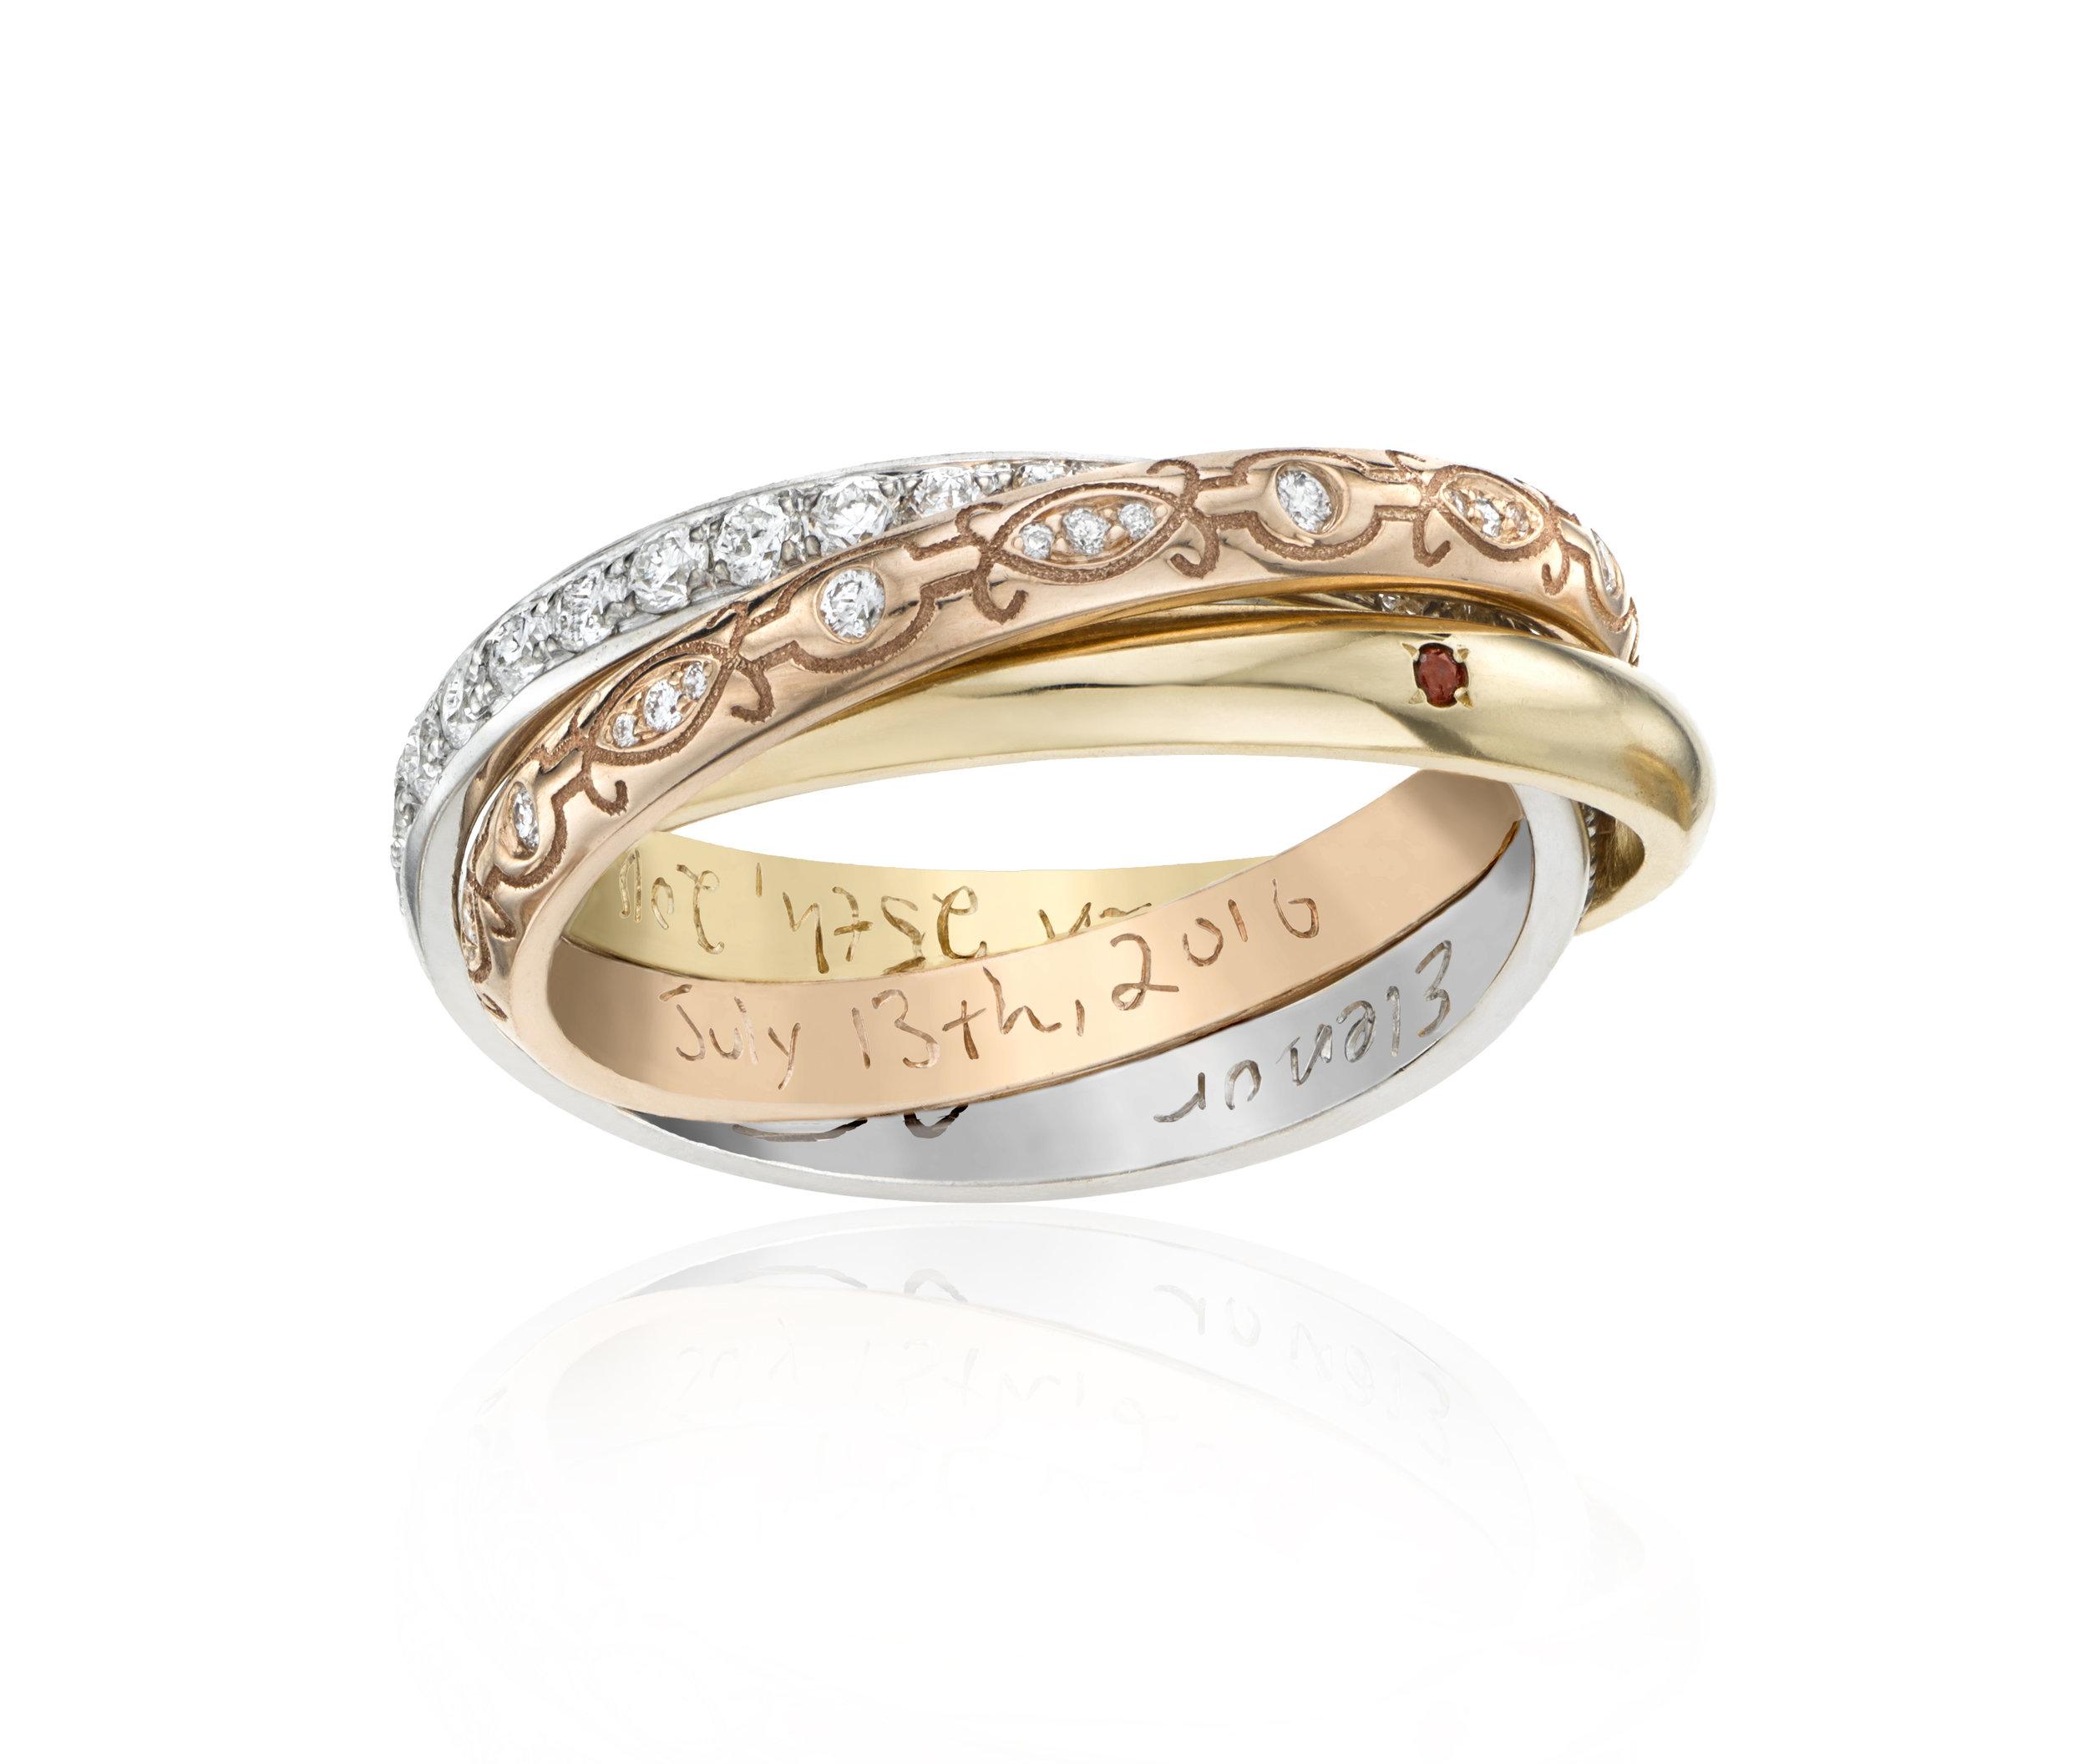 Richard Standard ring.jpg